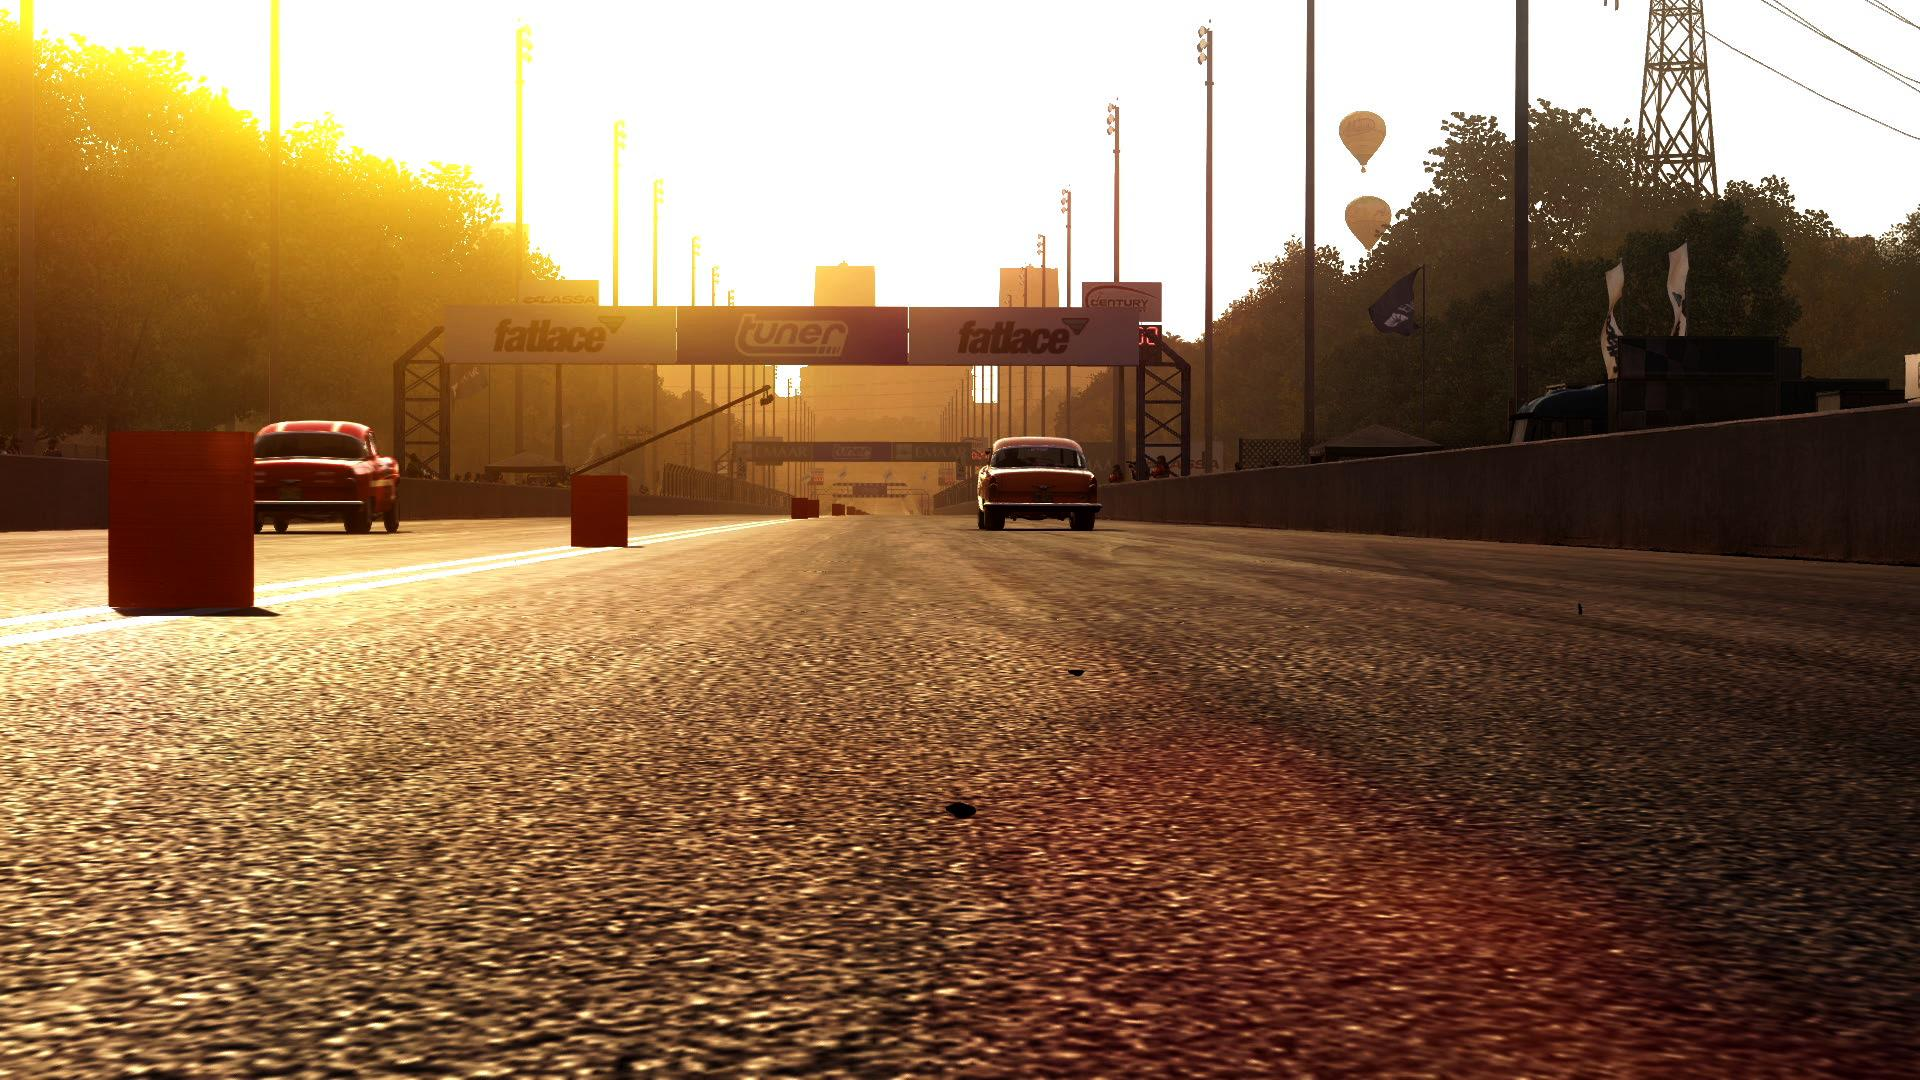 GRID: Autosport gets Drag Racing DLC pack - VG247